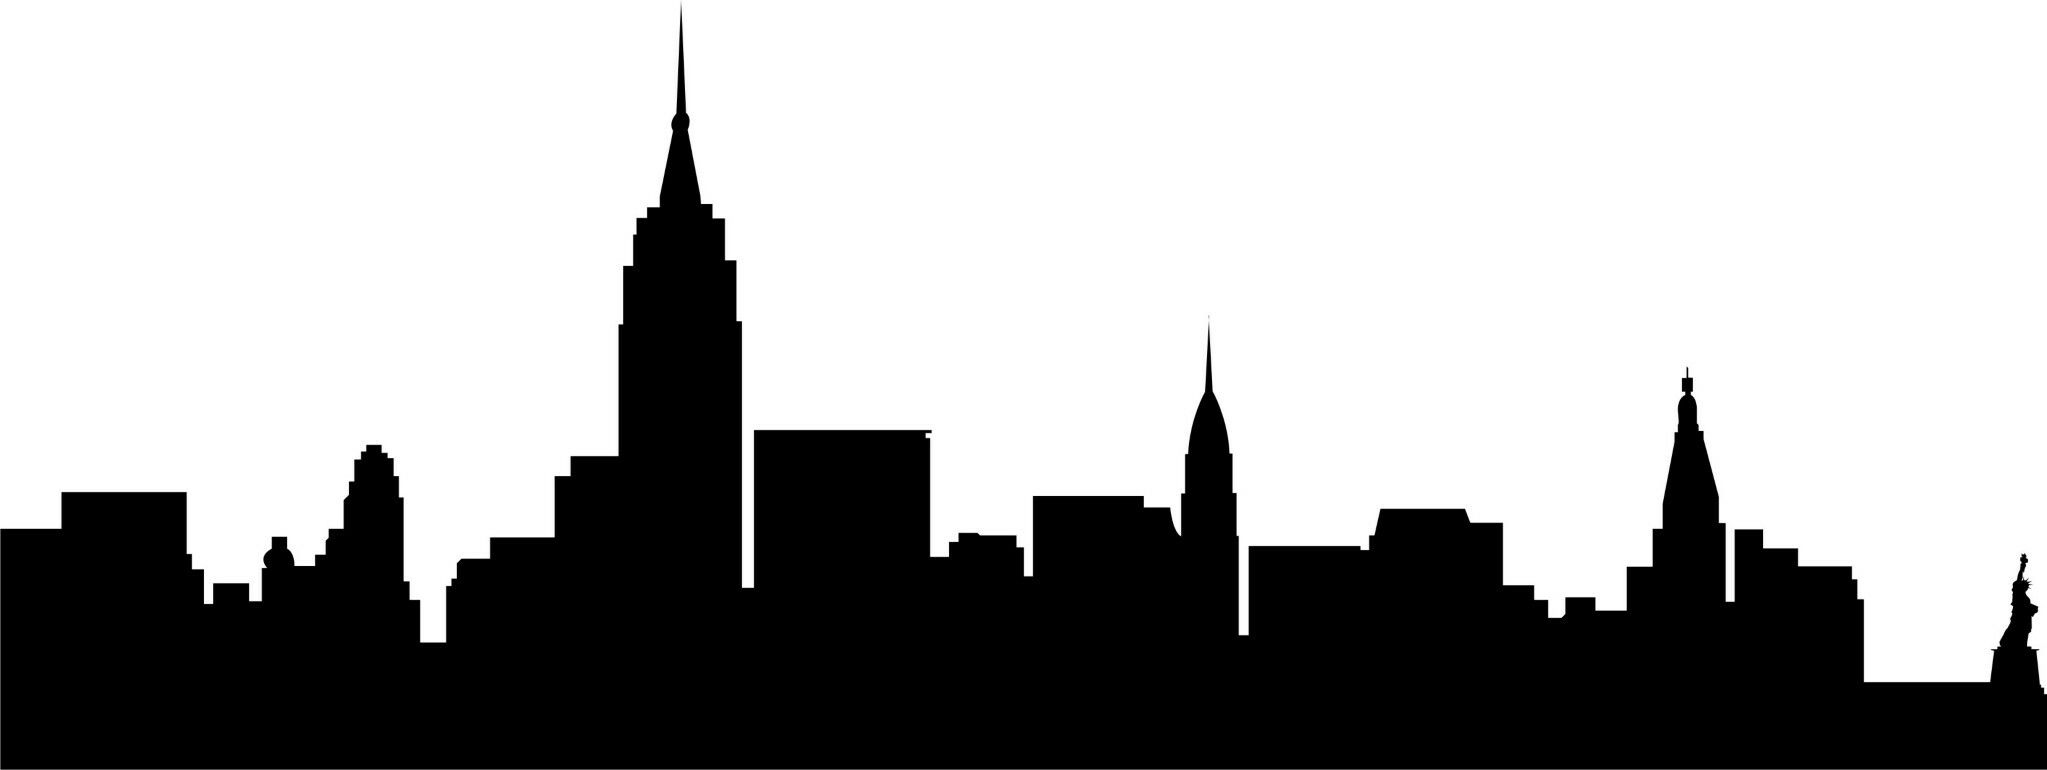 2047x770 Philly Skyline Silhouette